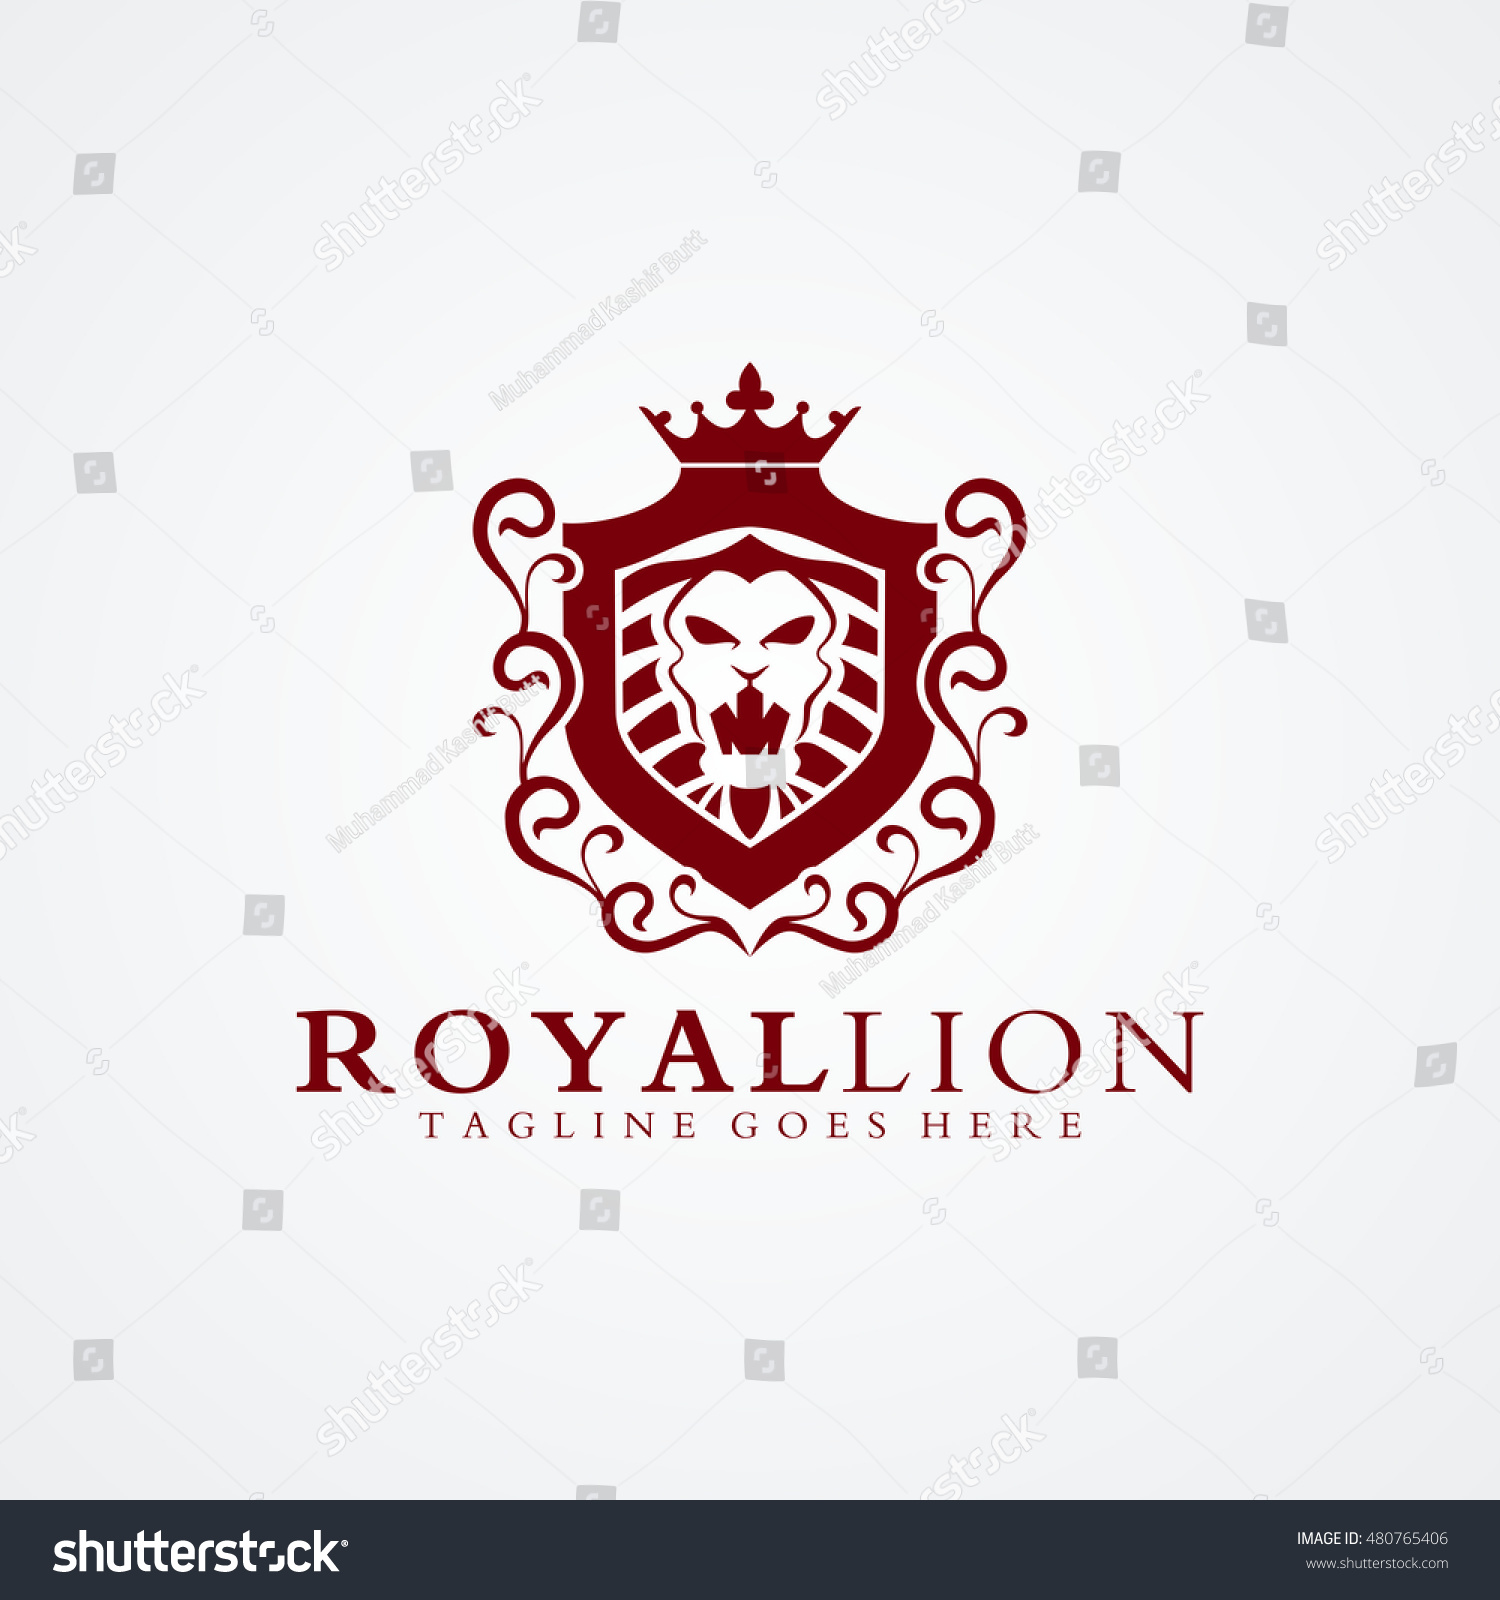 royal lion logo 02 available vectorillustration stock